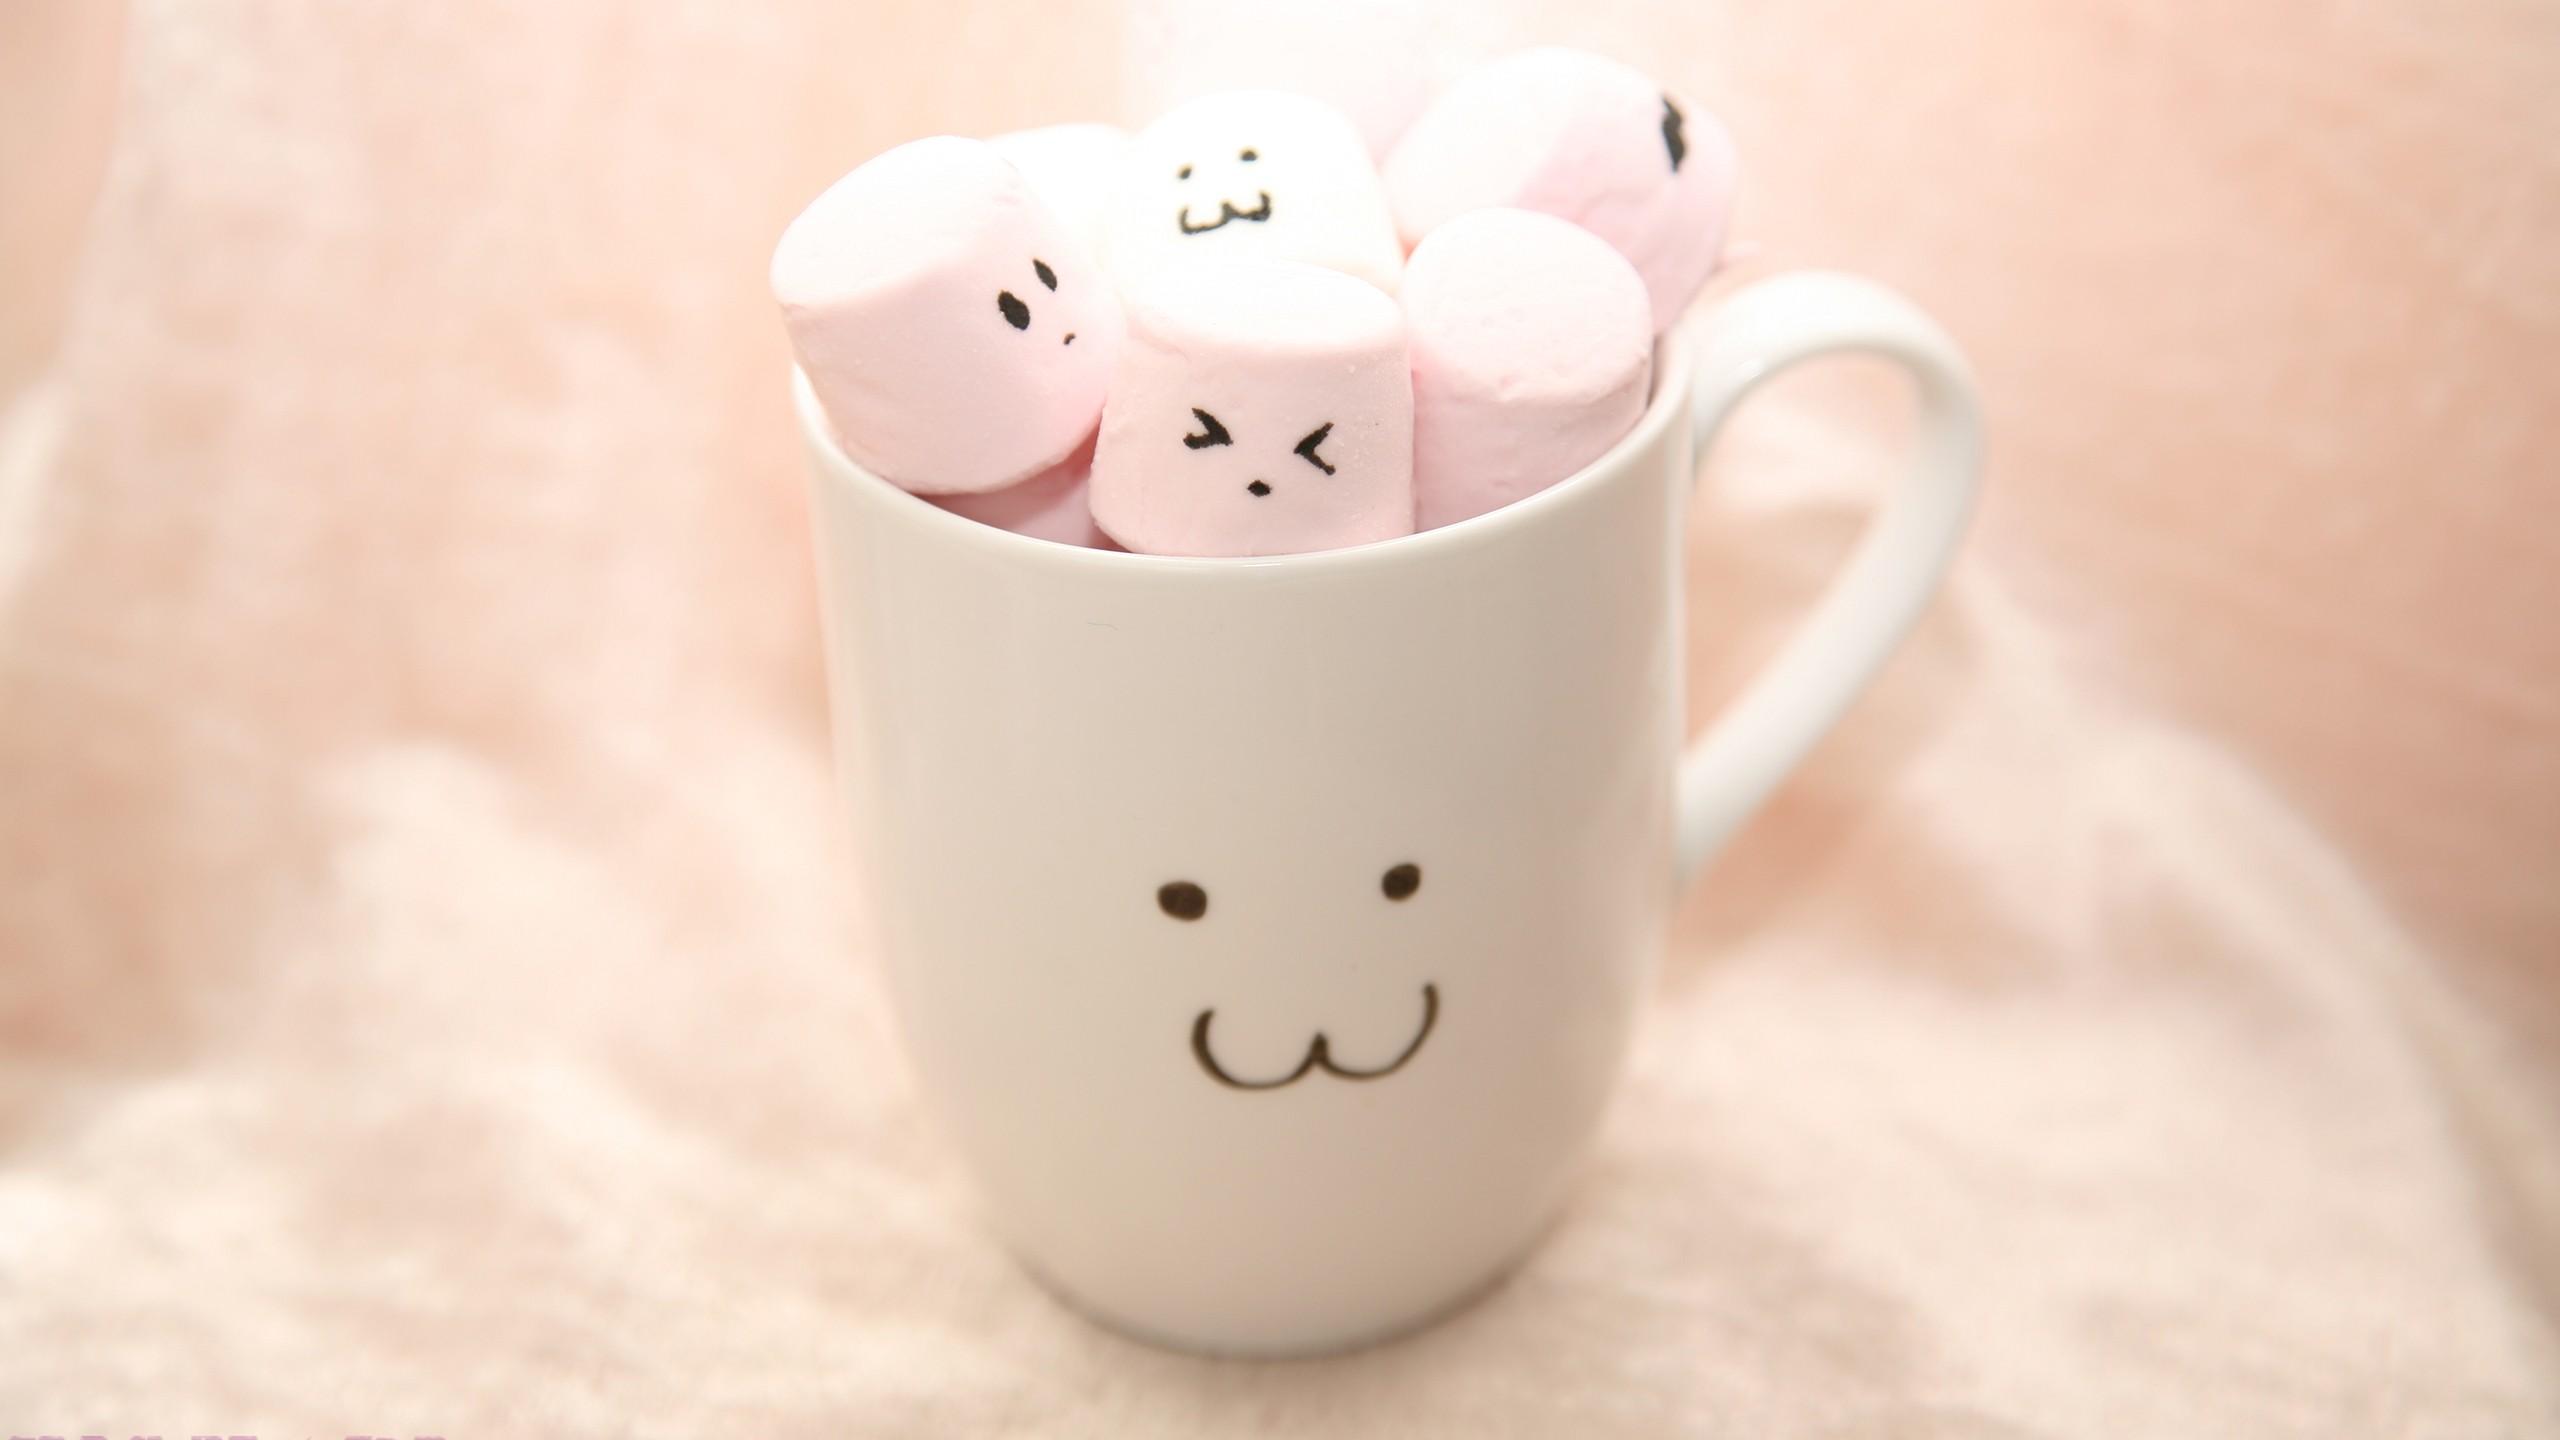 Cute Marshmallow Wallpaper 38871 1920x1200 px